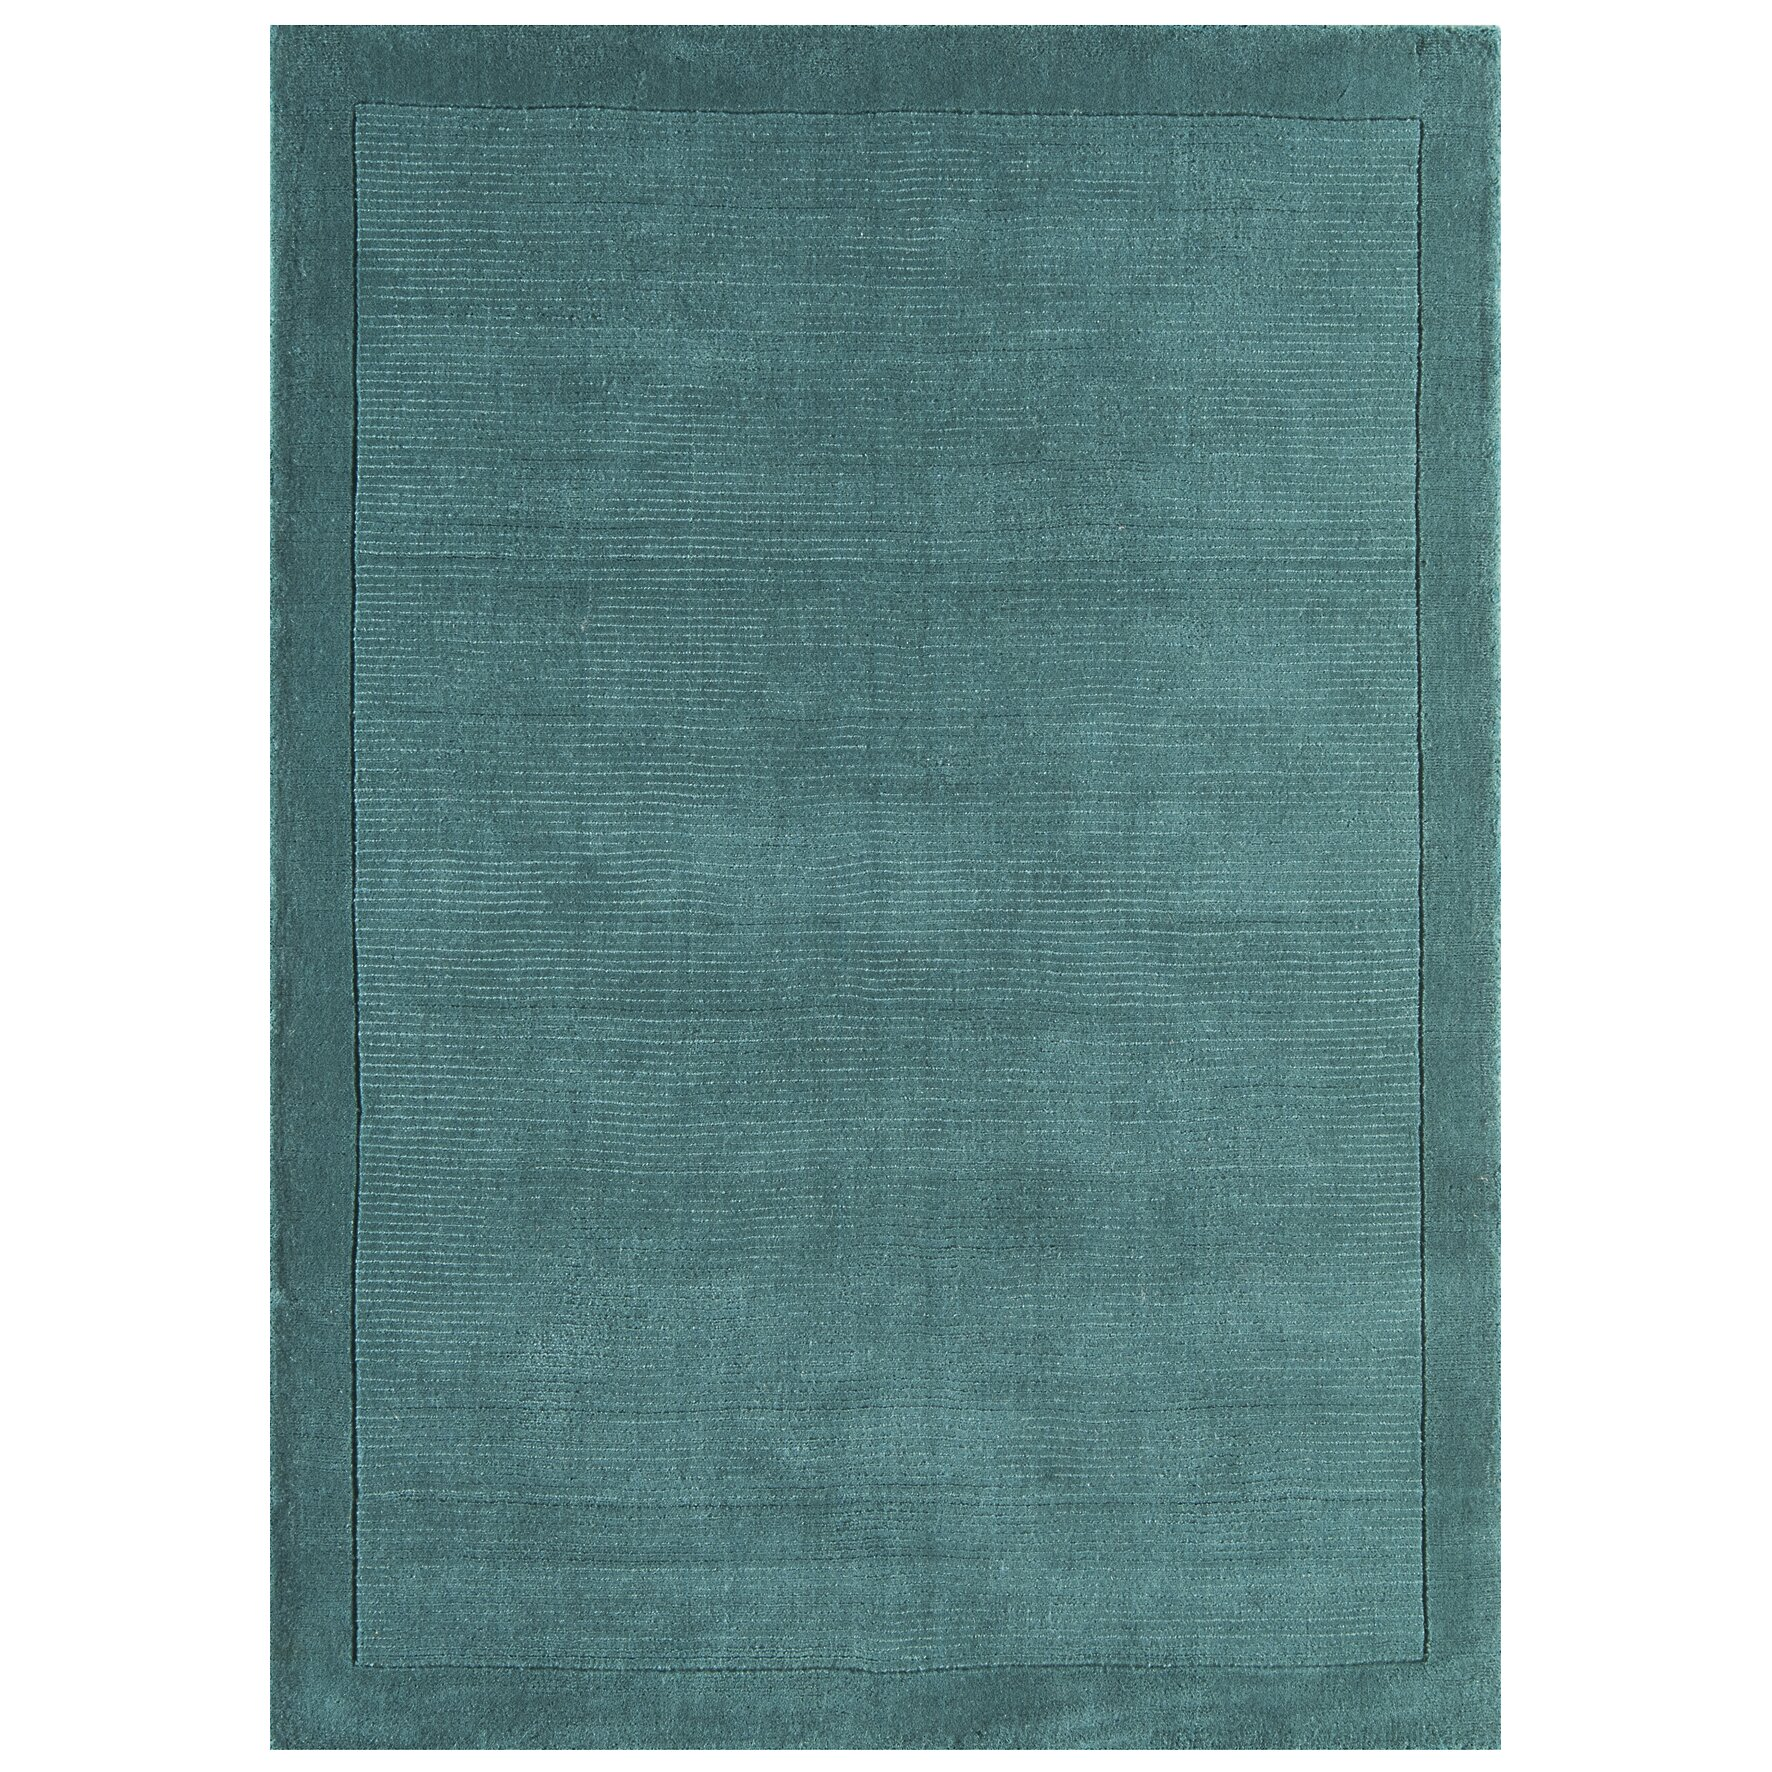 Asiatic Carpets Ltd Handgewebter Teppich York in Türkis